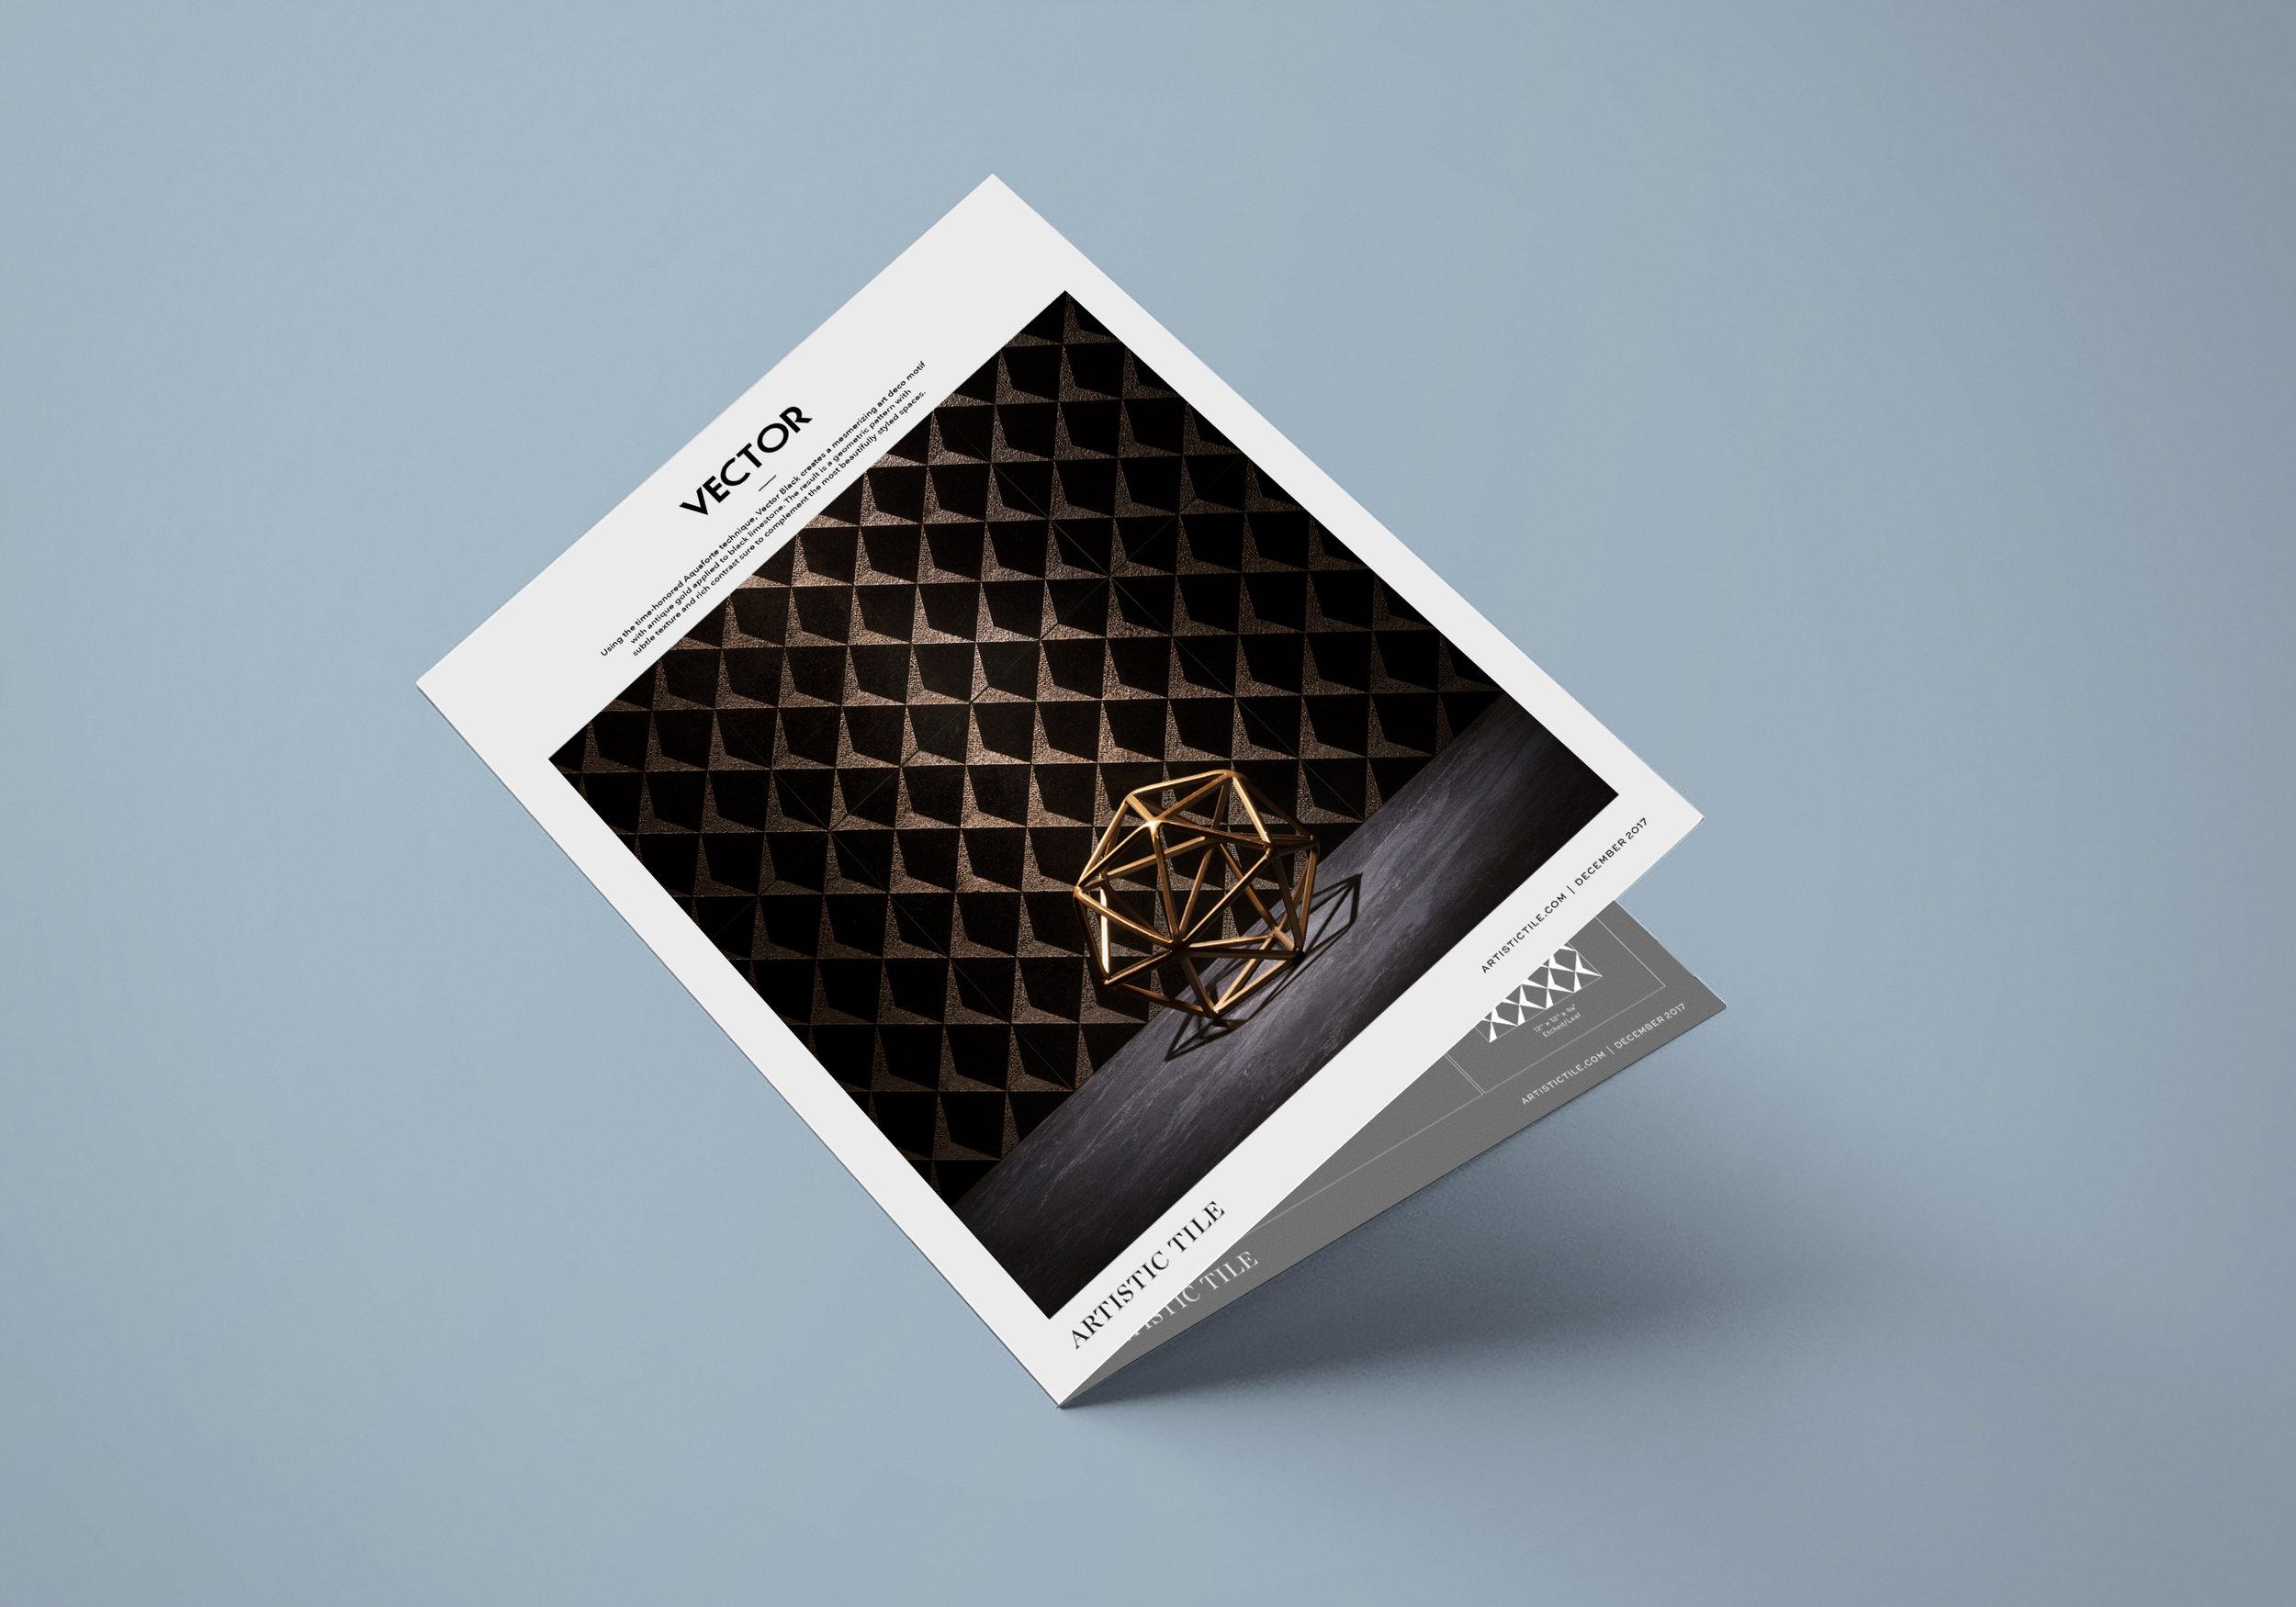 Lux Tile Product Literature